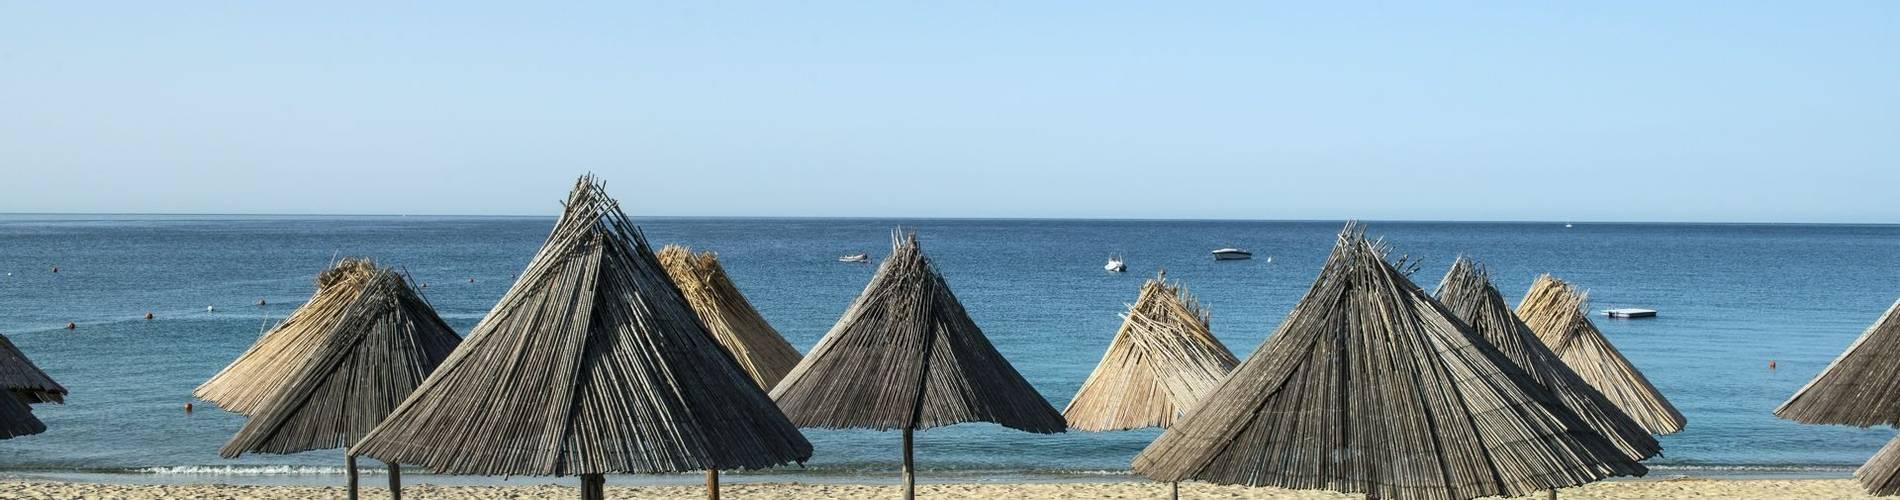 The beach at Hotel Cormoran, Villasimius